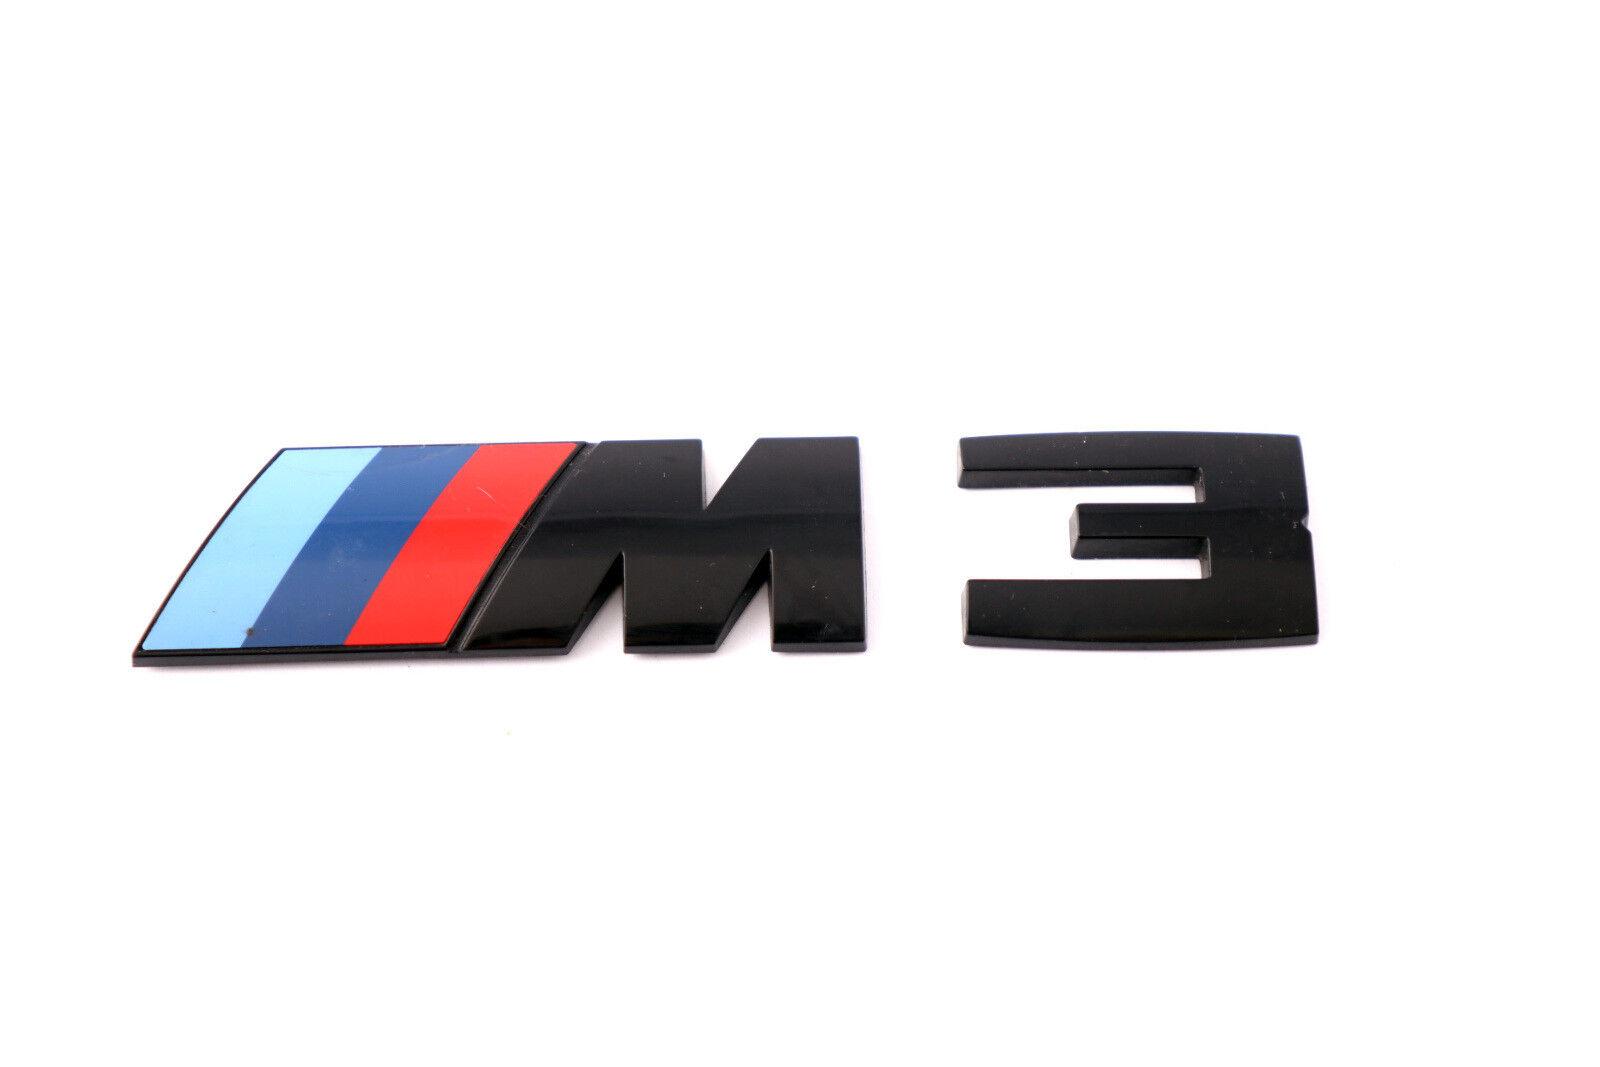 BMW NEW GENUINE F30 F31 3 SERIES M3 BLACK LABEL STICKER BADGE EMBLEM 8068580